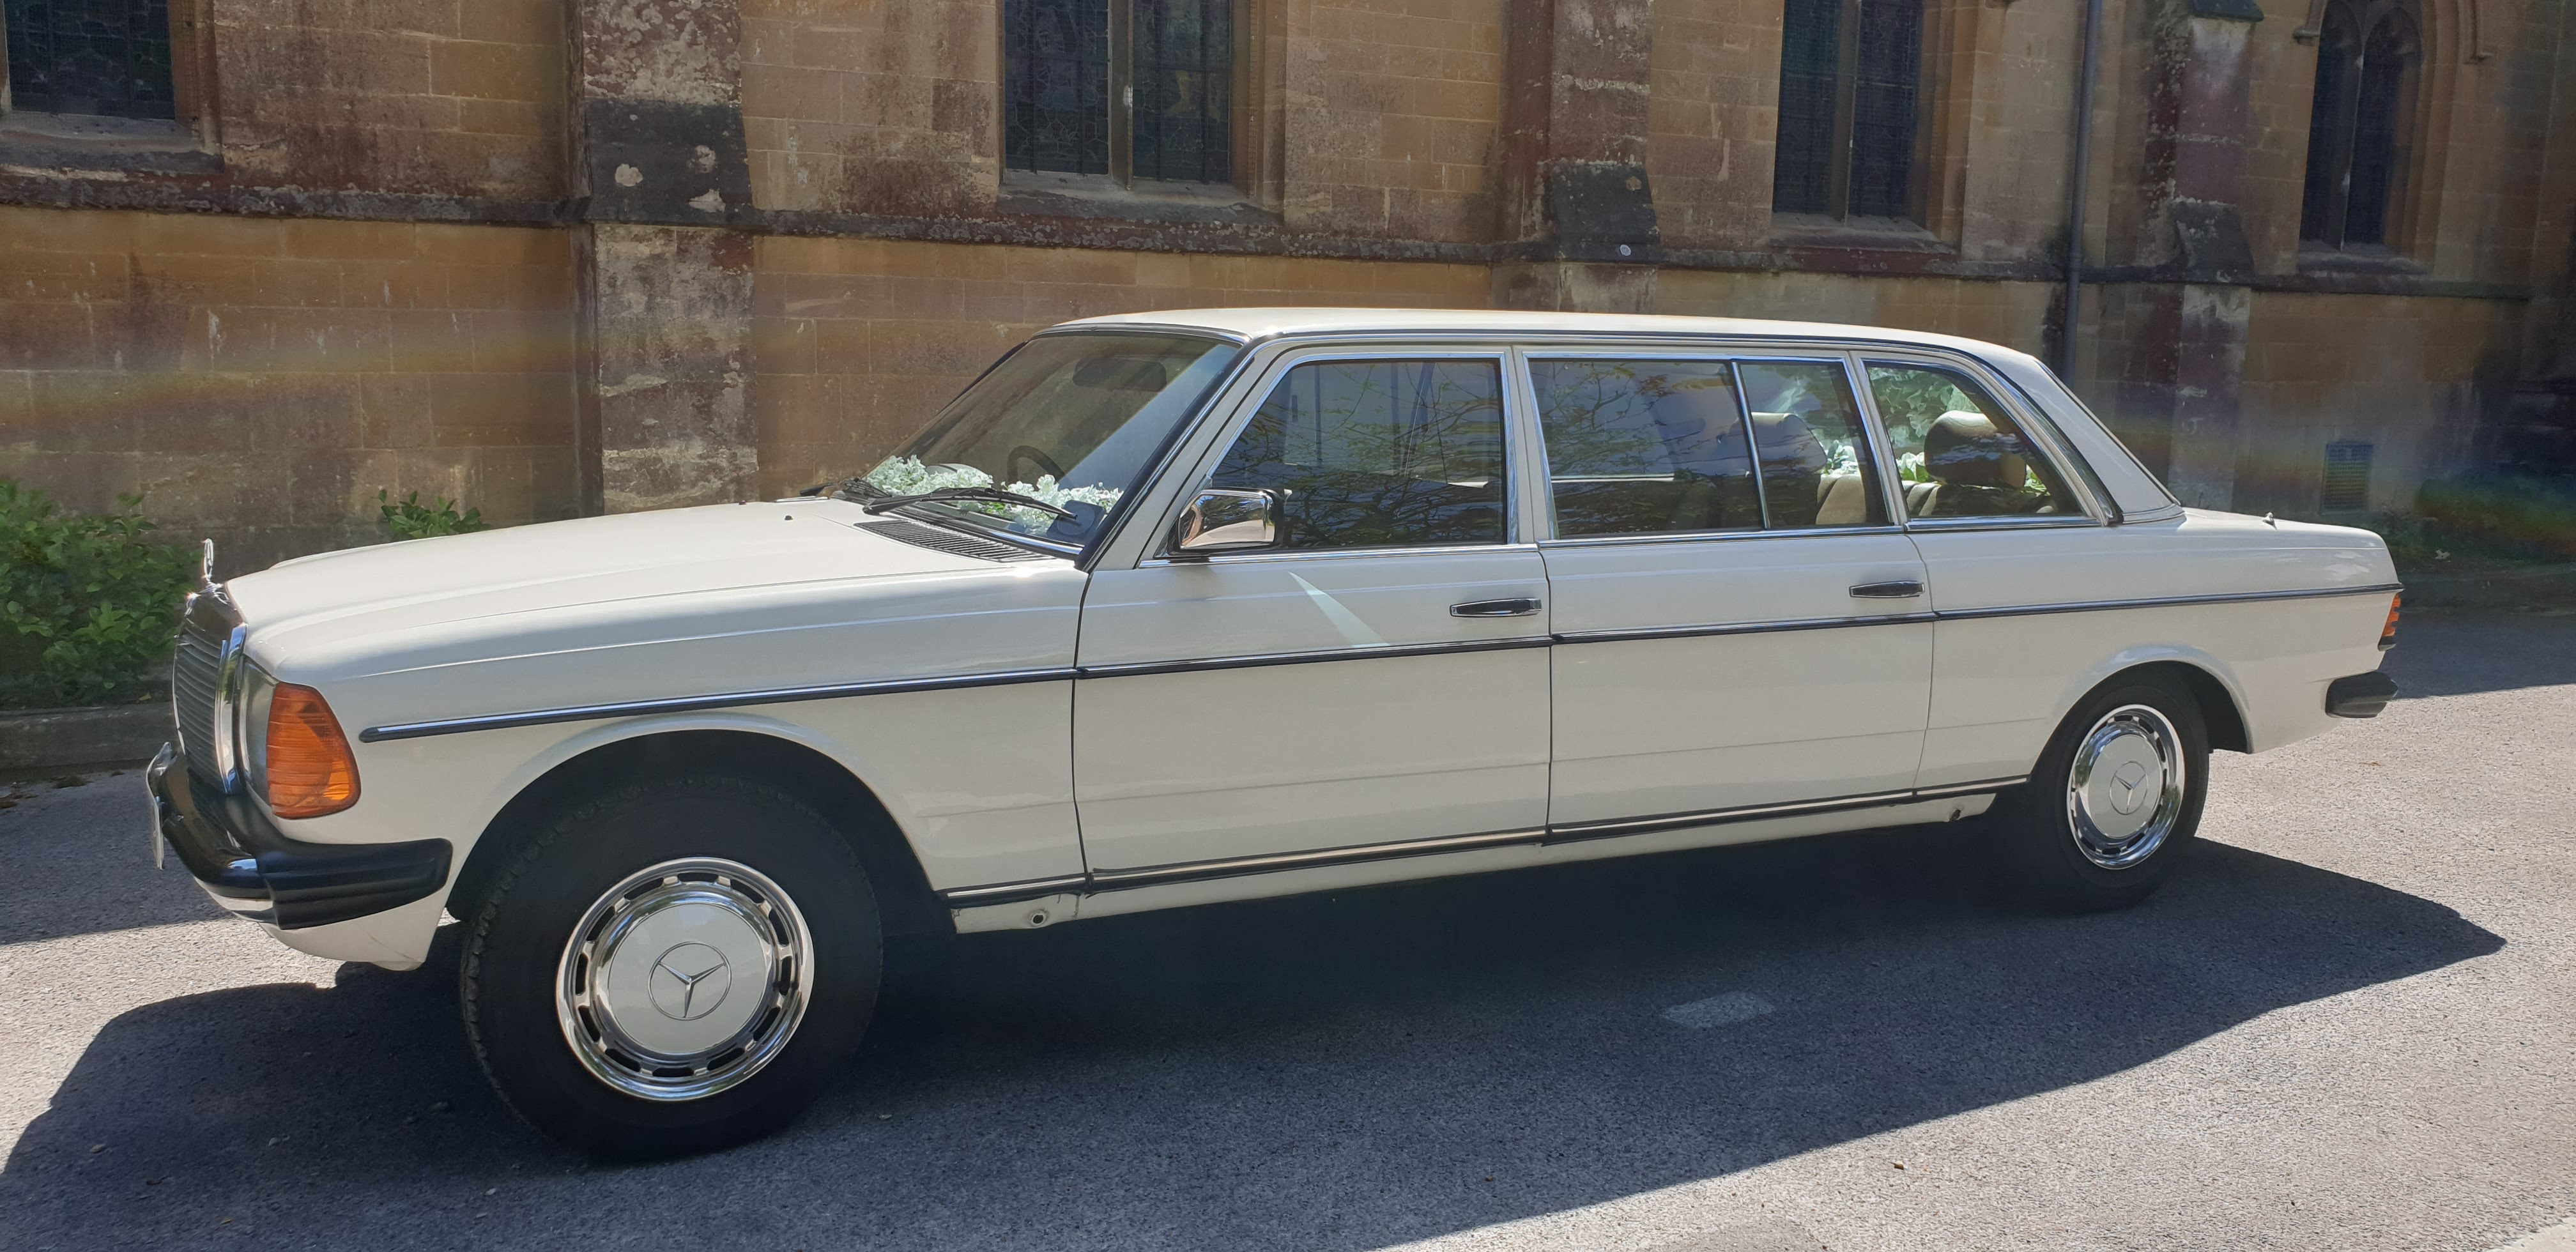 Mercedes-benz W123 Limousine Hire Dorset